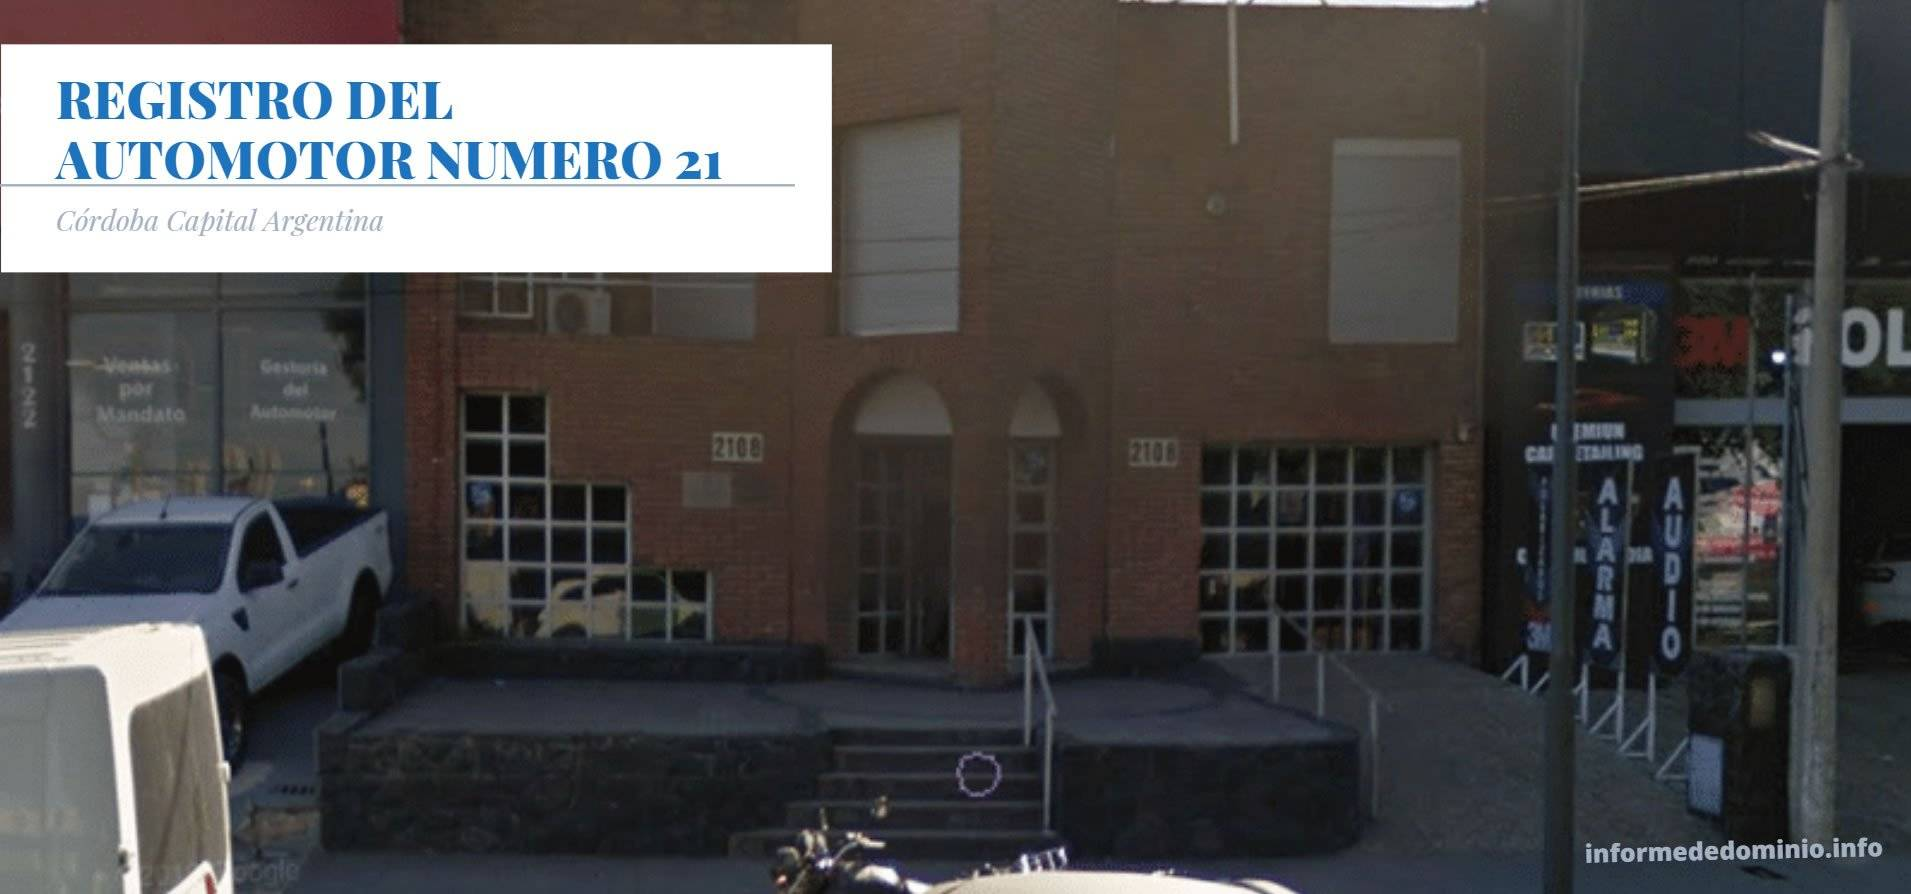 Registro Automotor Número 21 de Cordoba Capital